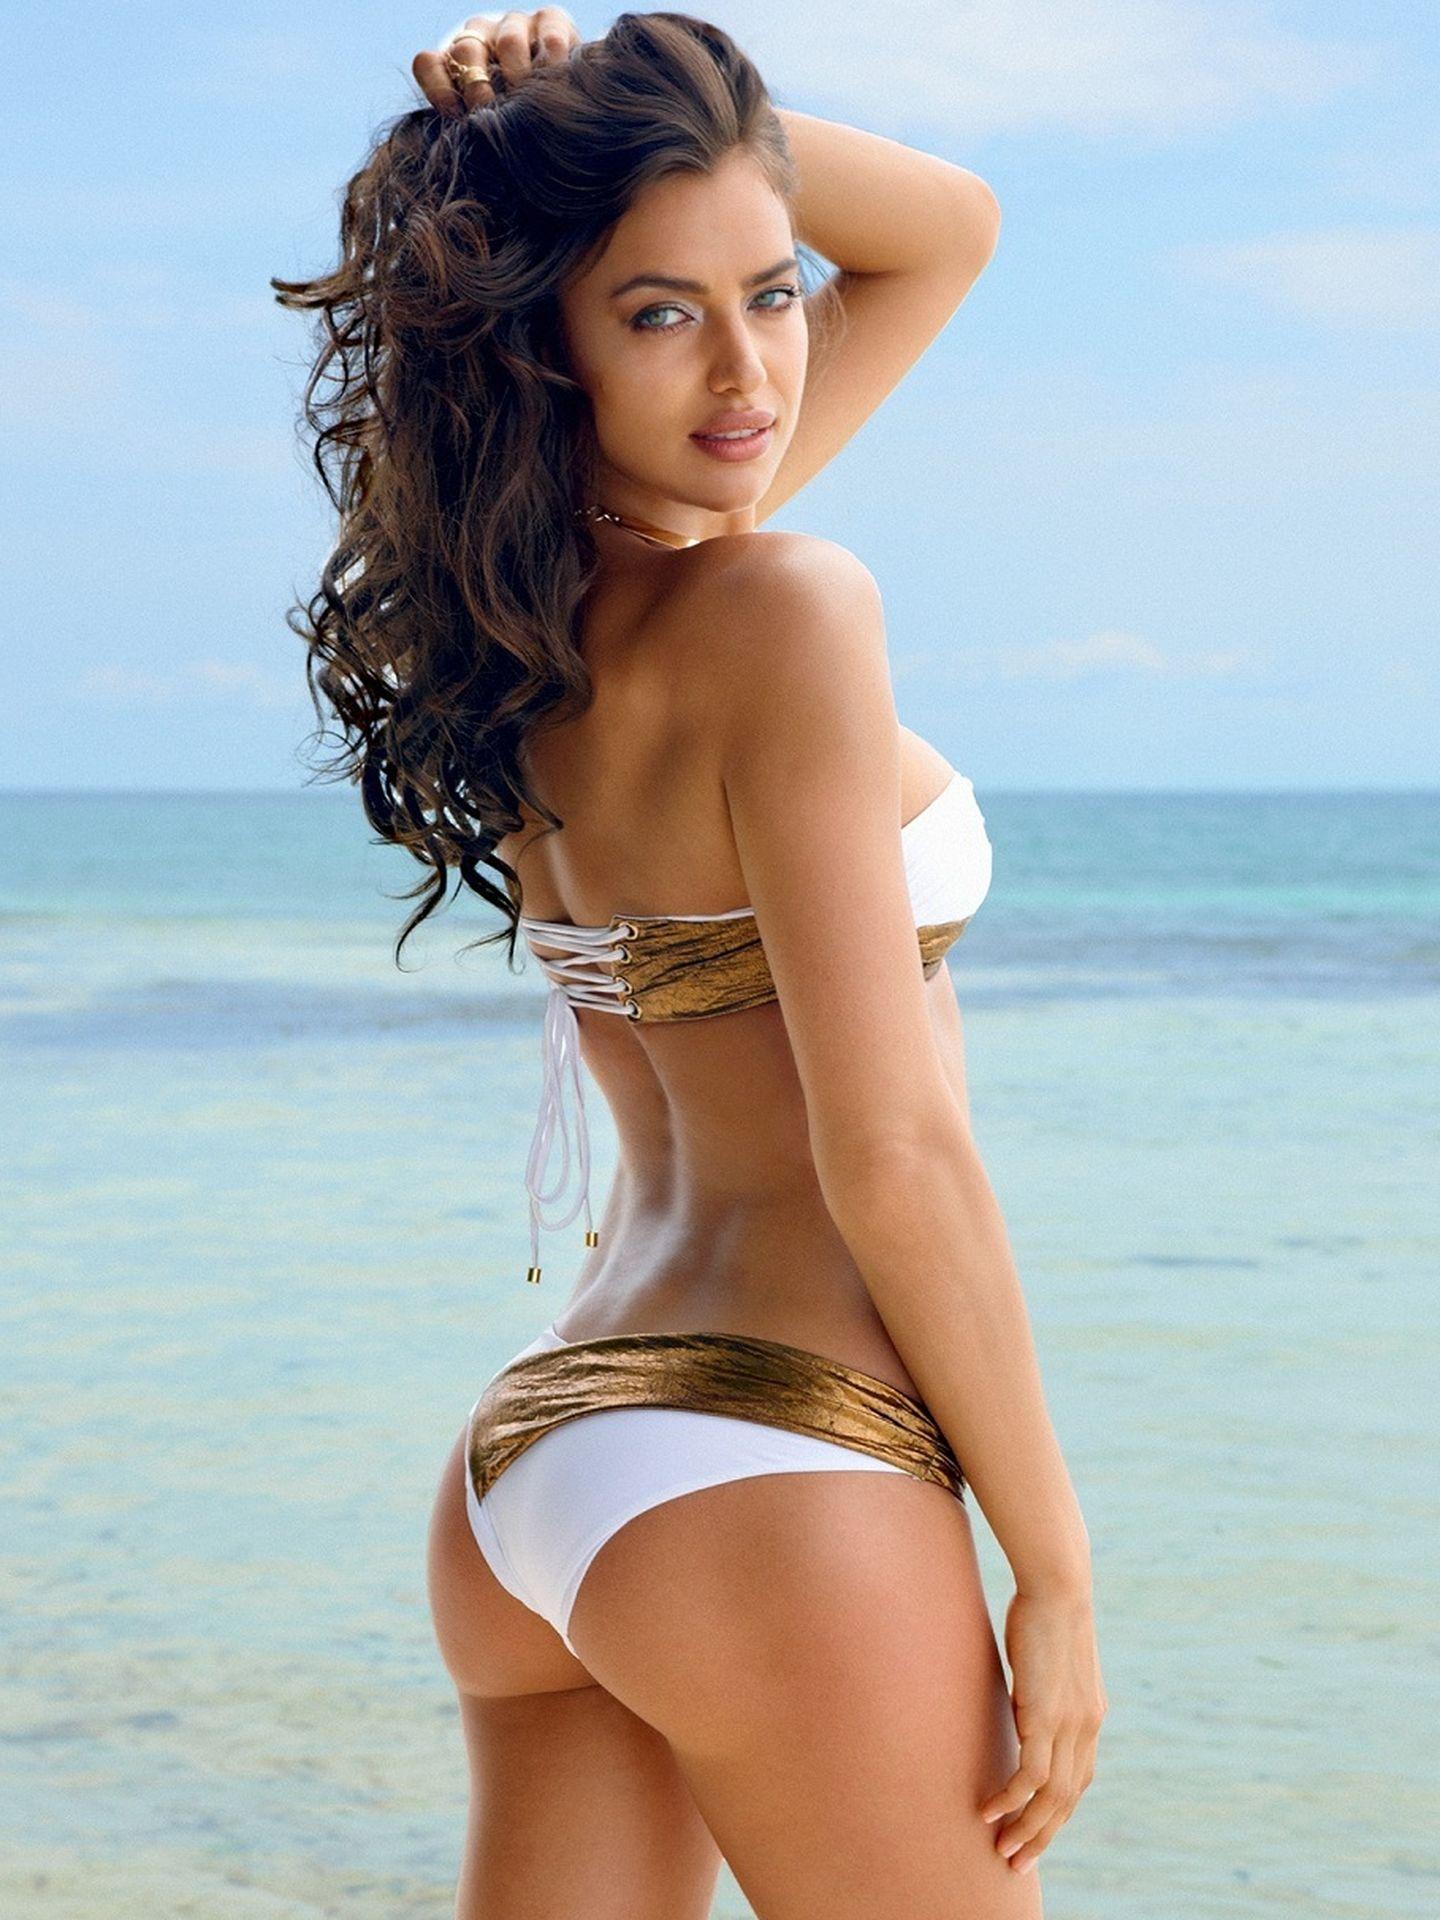 Irina Shayk, en una imagen publicitaria de Victoria's Secret